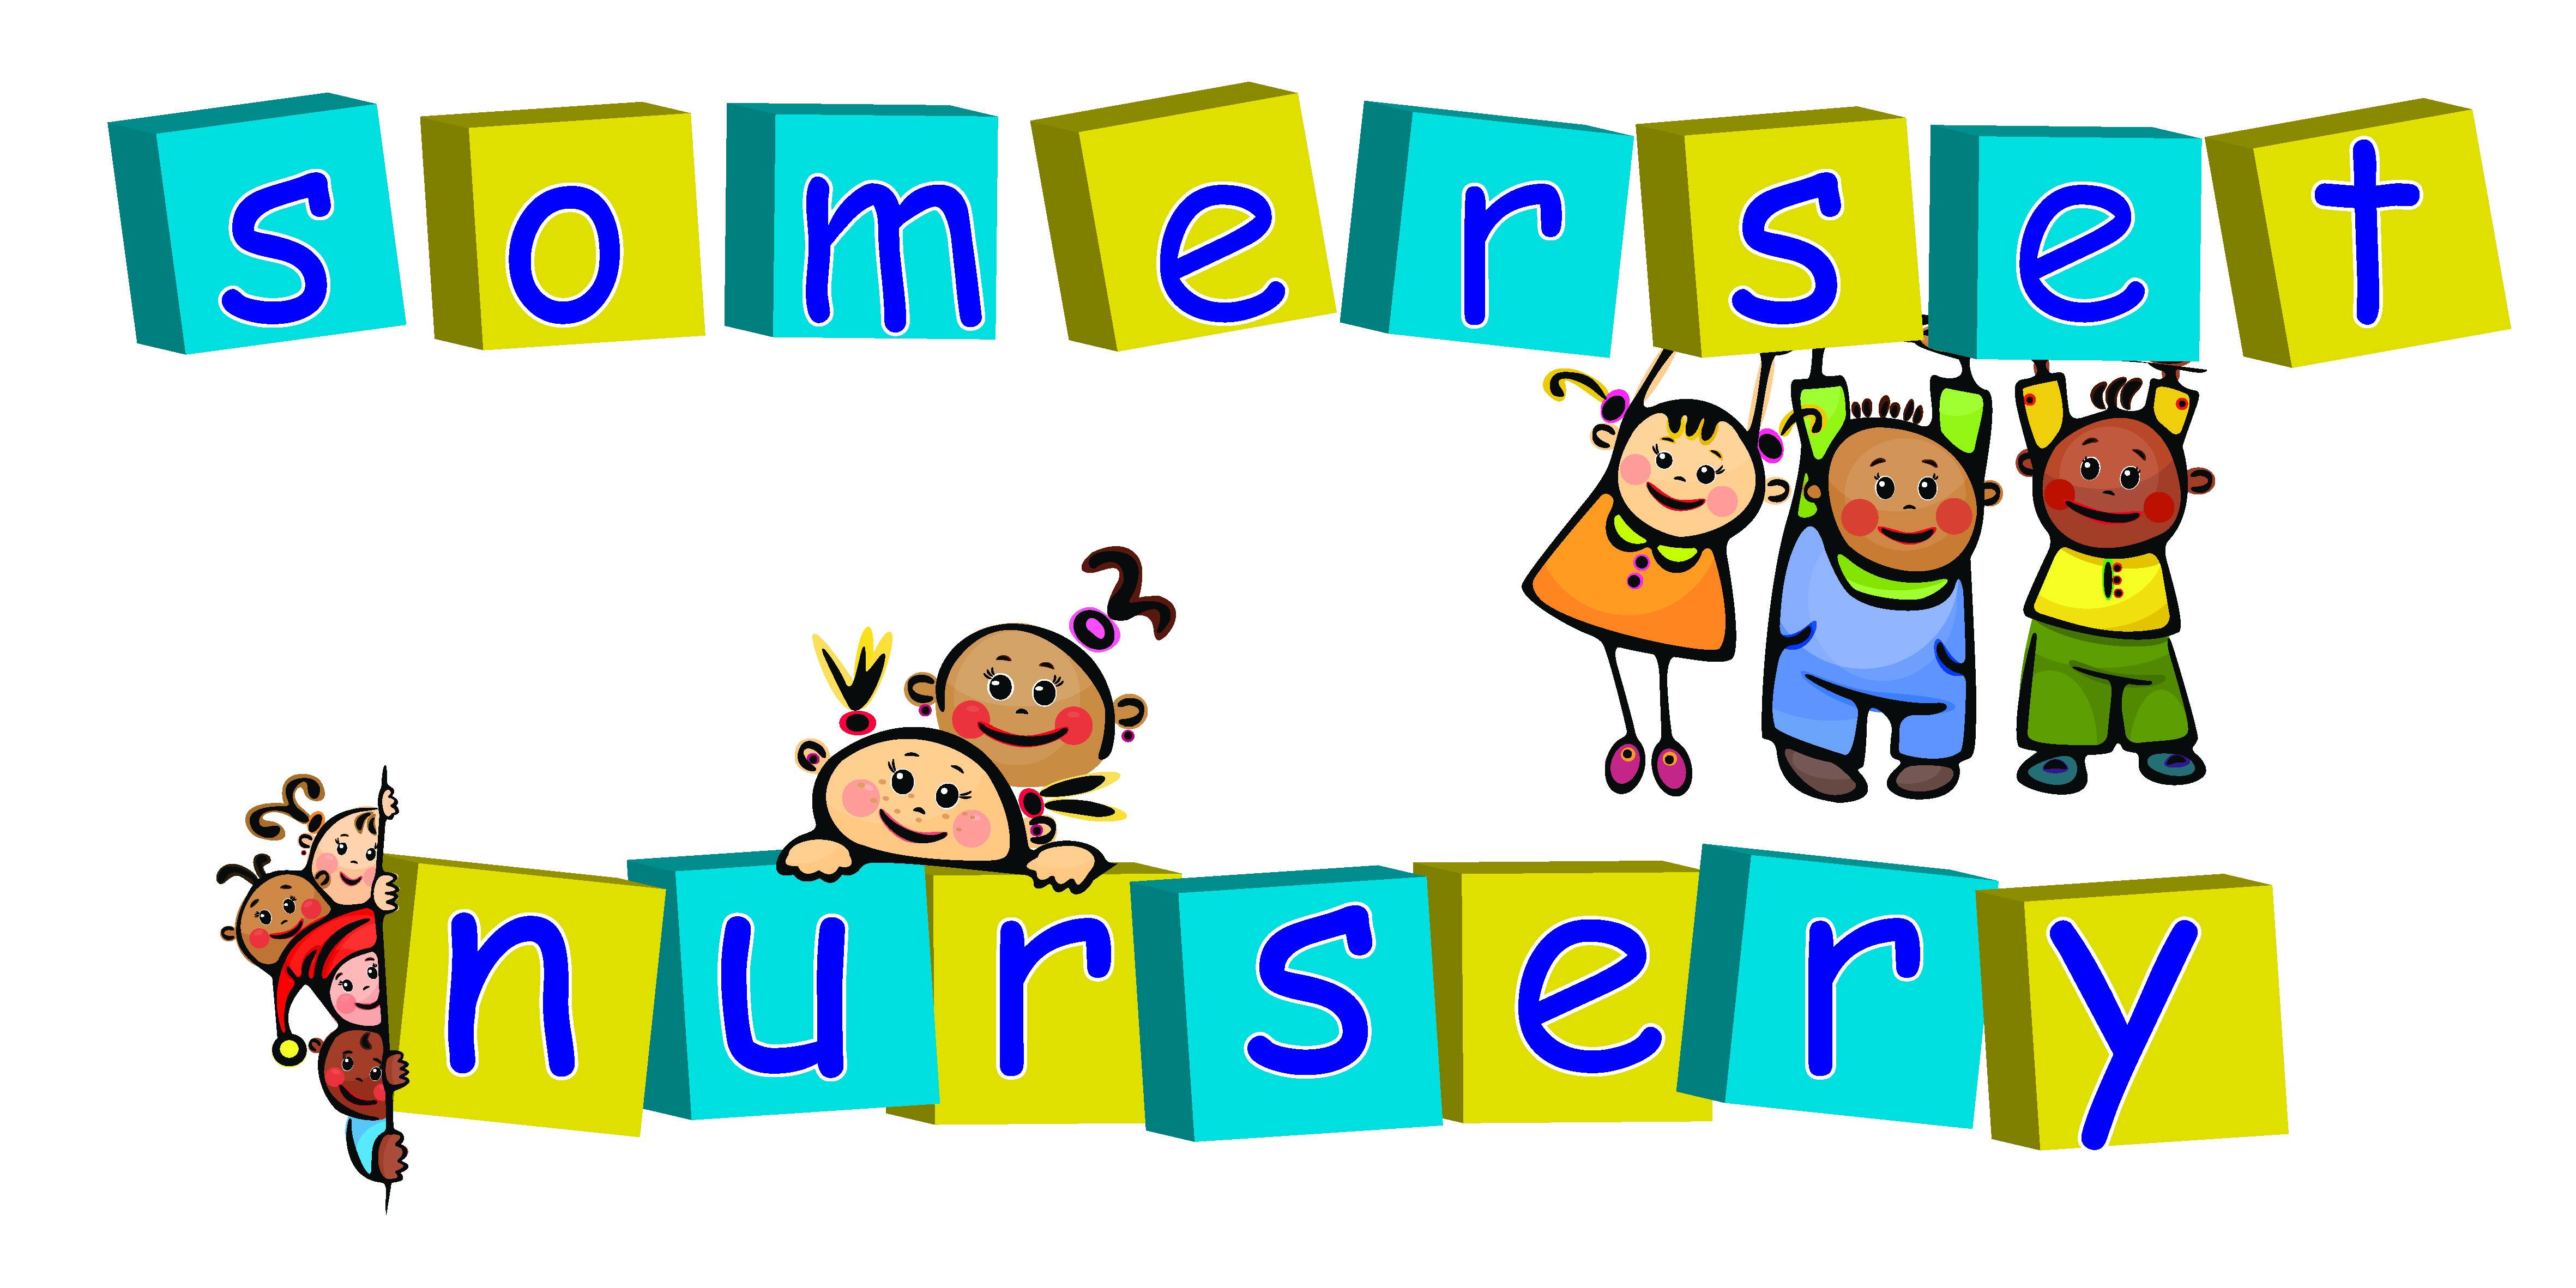 Somerset Nursery - Clairmont